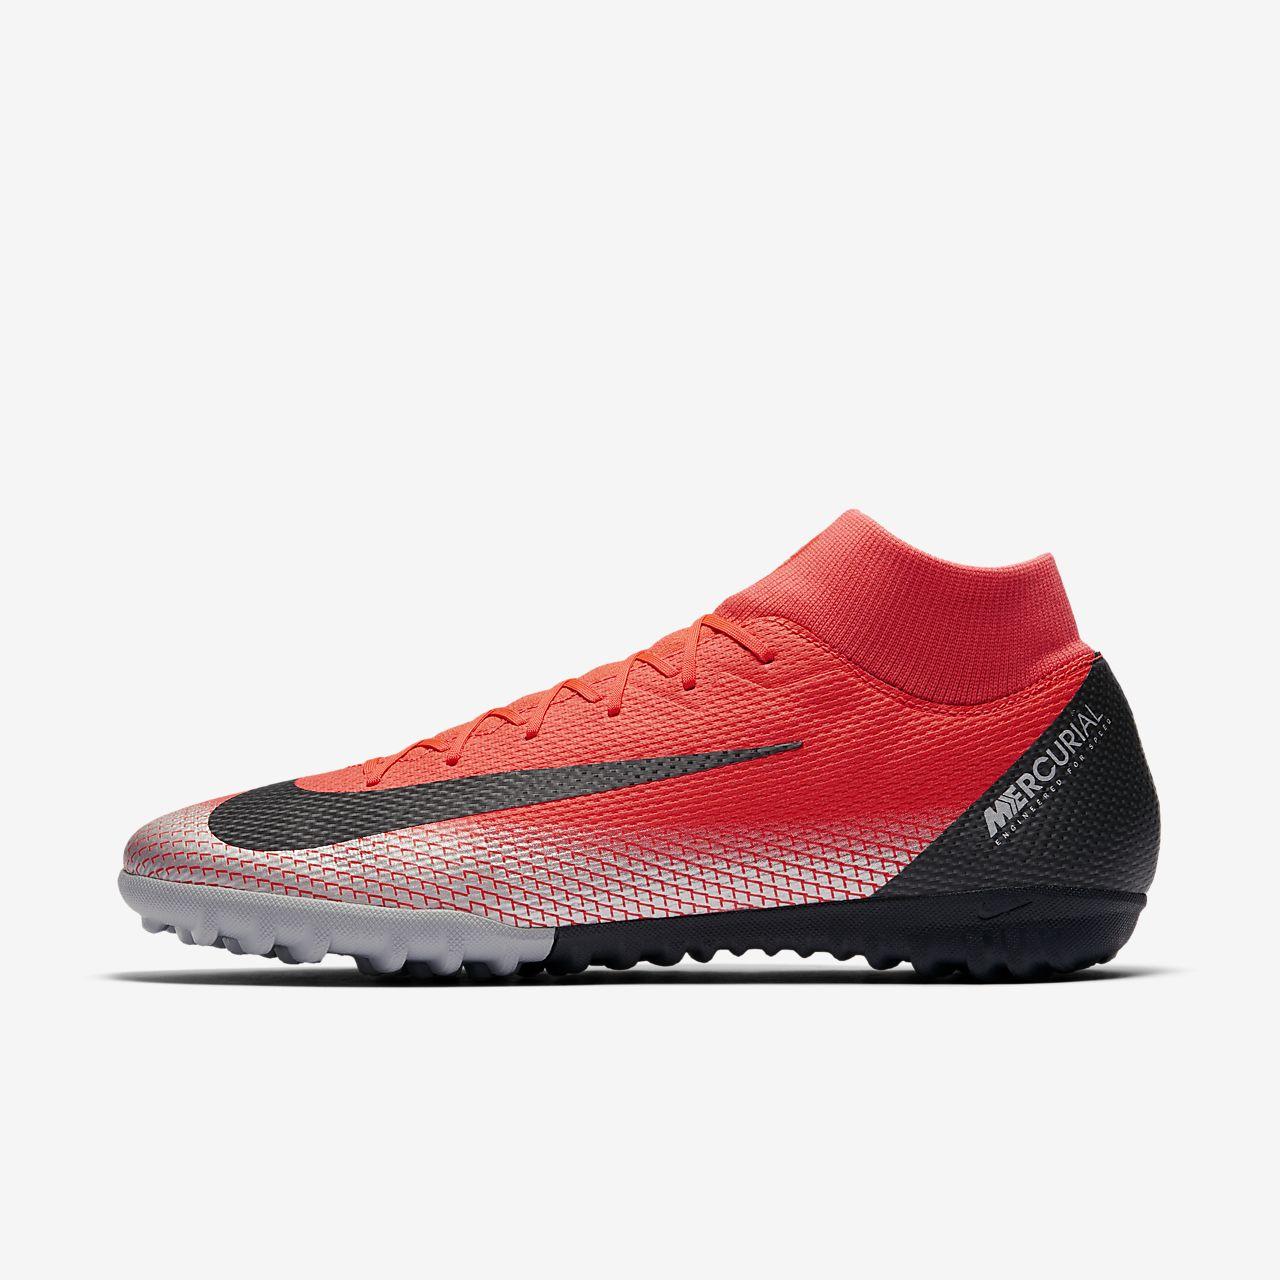 d6ac1f6ff Nike SuperflyX 6 Academy TF Turf Football Shoe. Nike.com SI